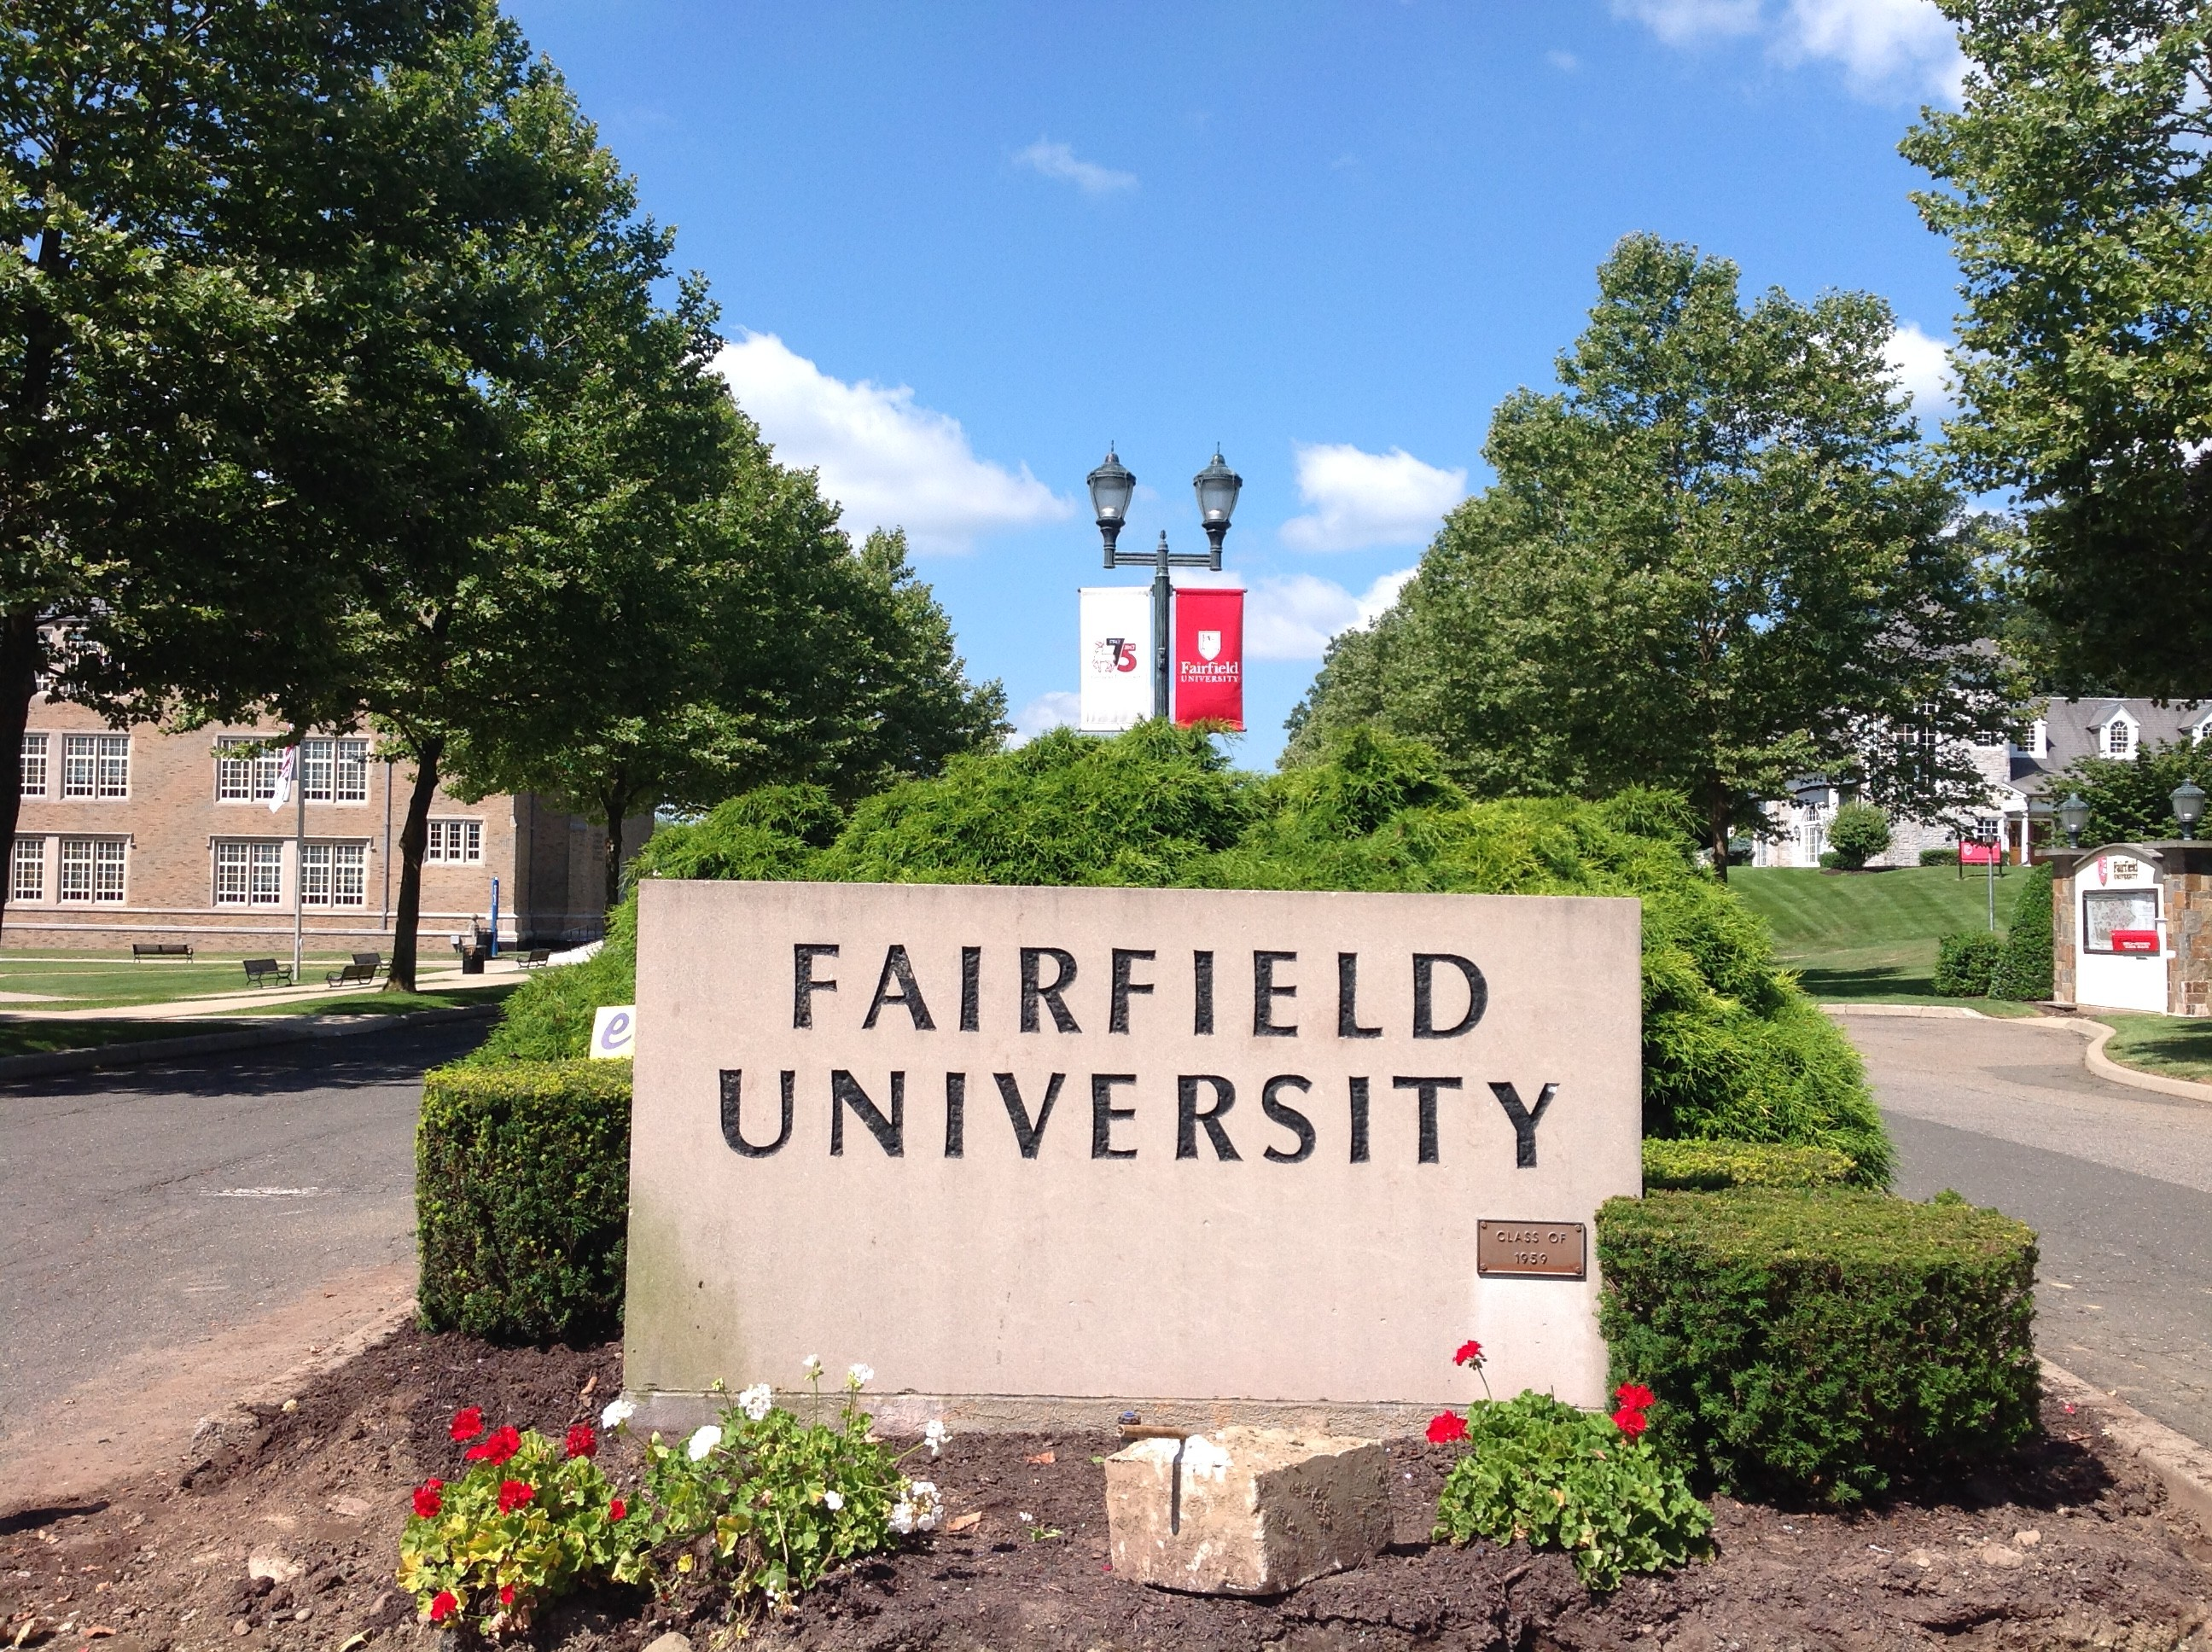 Fairfield University IMG_0224.jpg